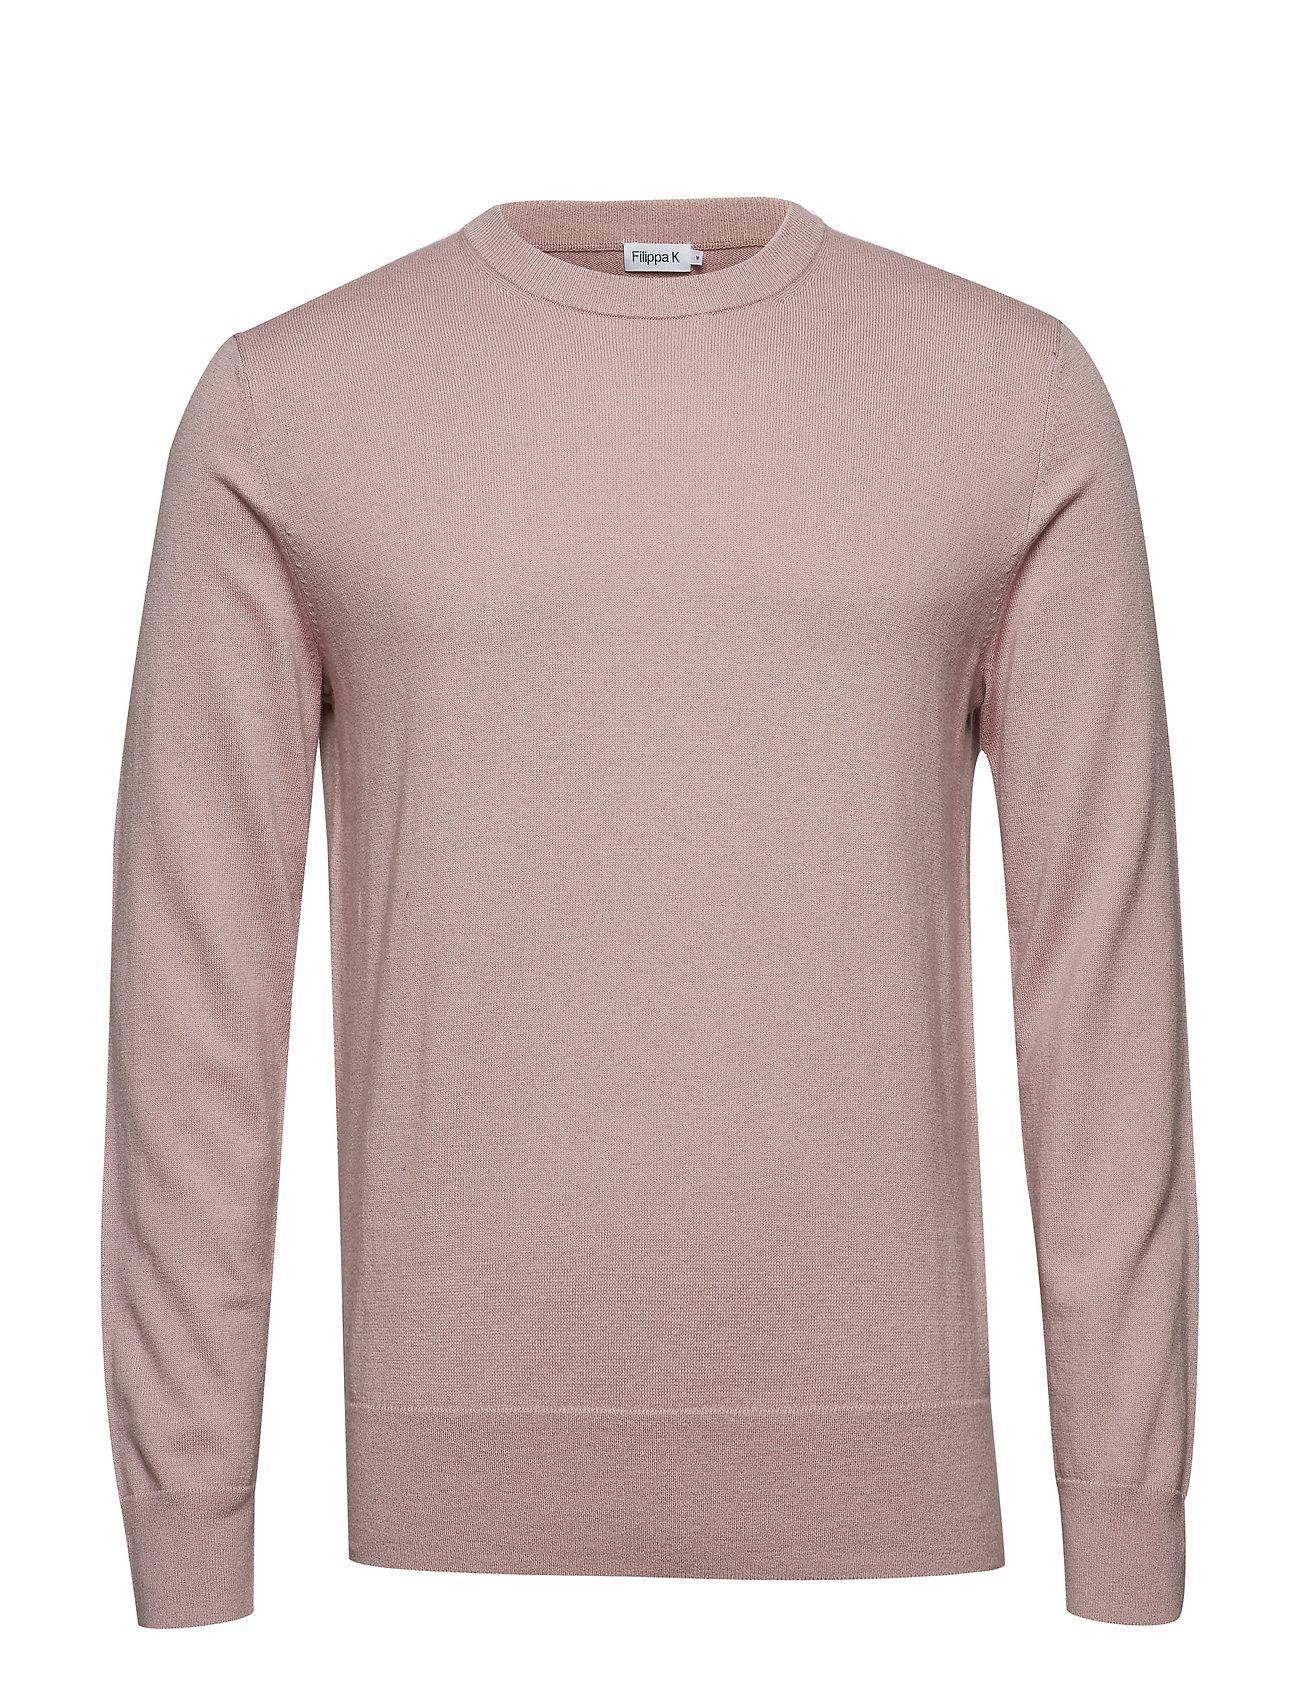 Filippa K M. Cotton Merino Basic Sweater Ögrönlar